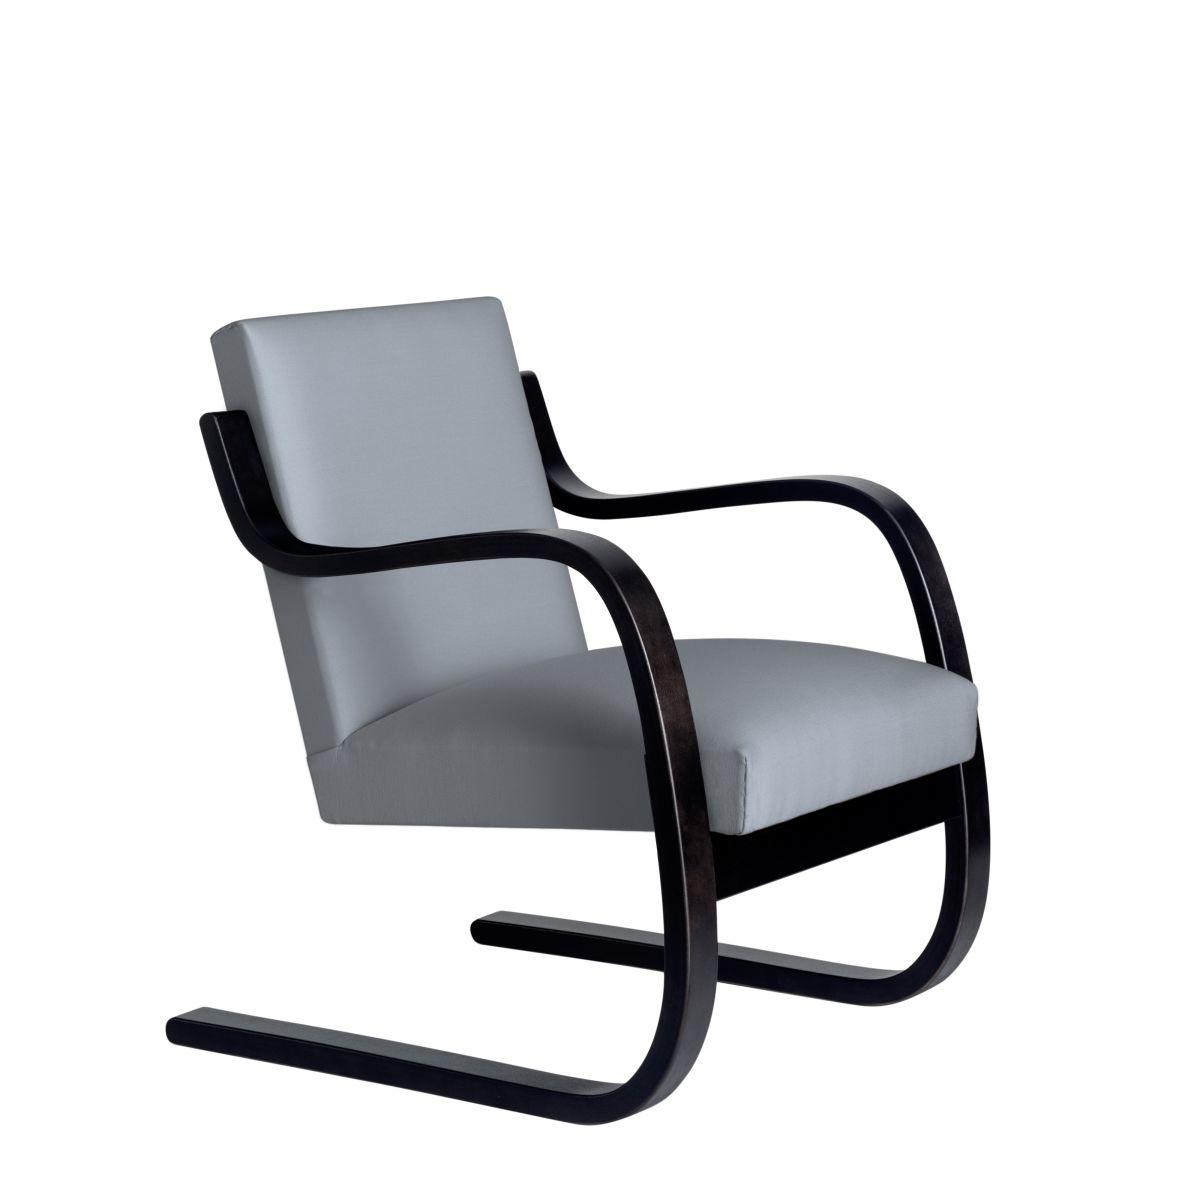 Armchair 402 Birch Blacl Laquer Seat Fabric Upholstery Artek Grey 2494506